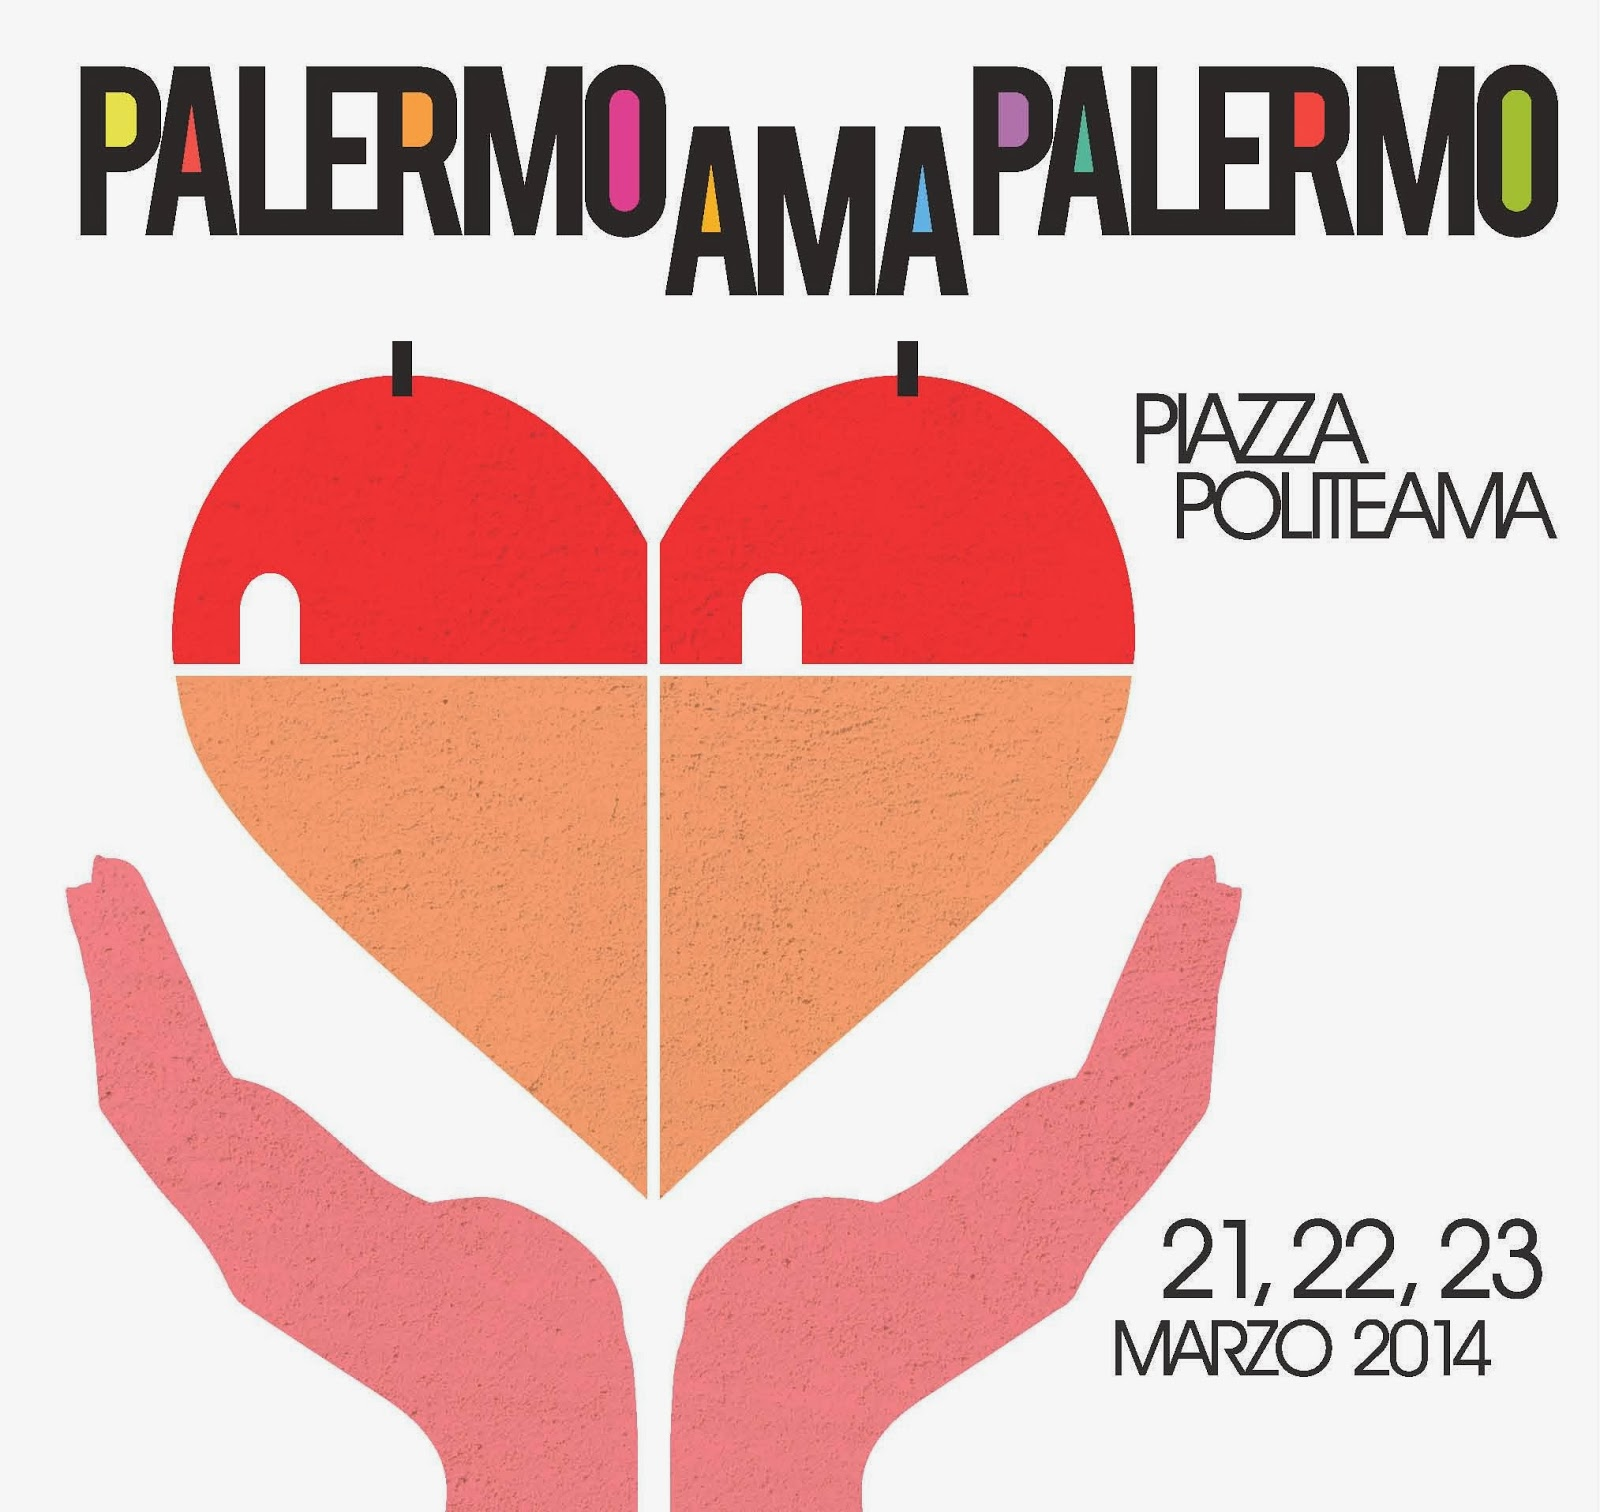 Locandina Palermo ama Palermo